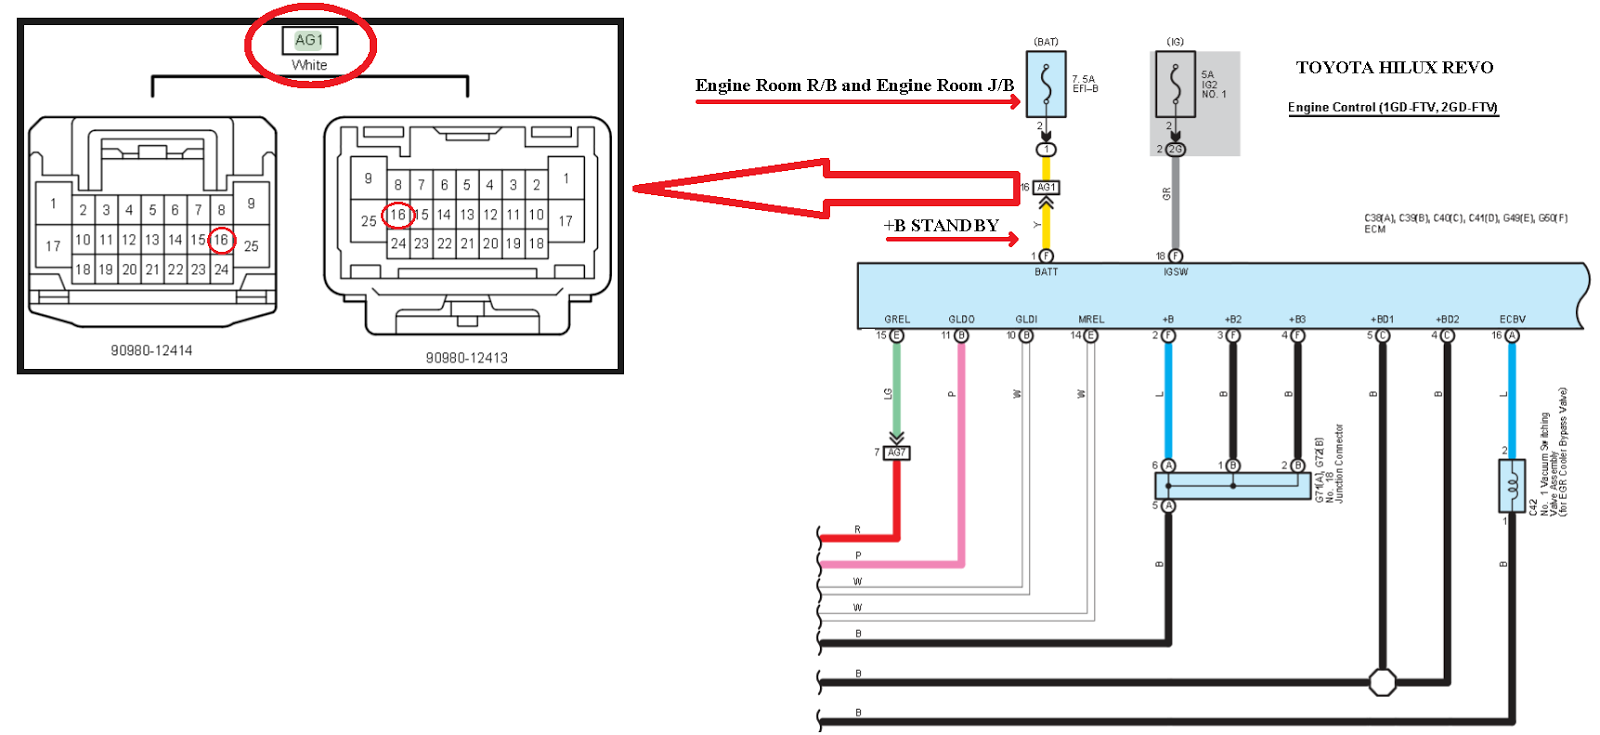 hight resolution of toyota hilux revo wiring wiring diagram nametoyota hilux revo wiring engine hilux revo ecm power source